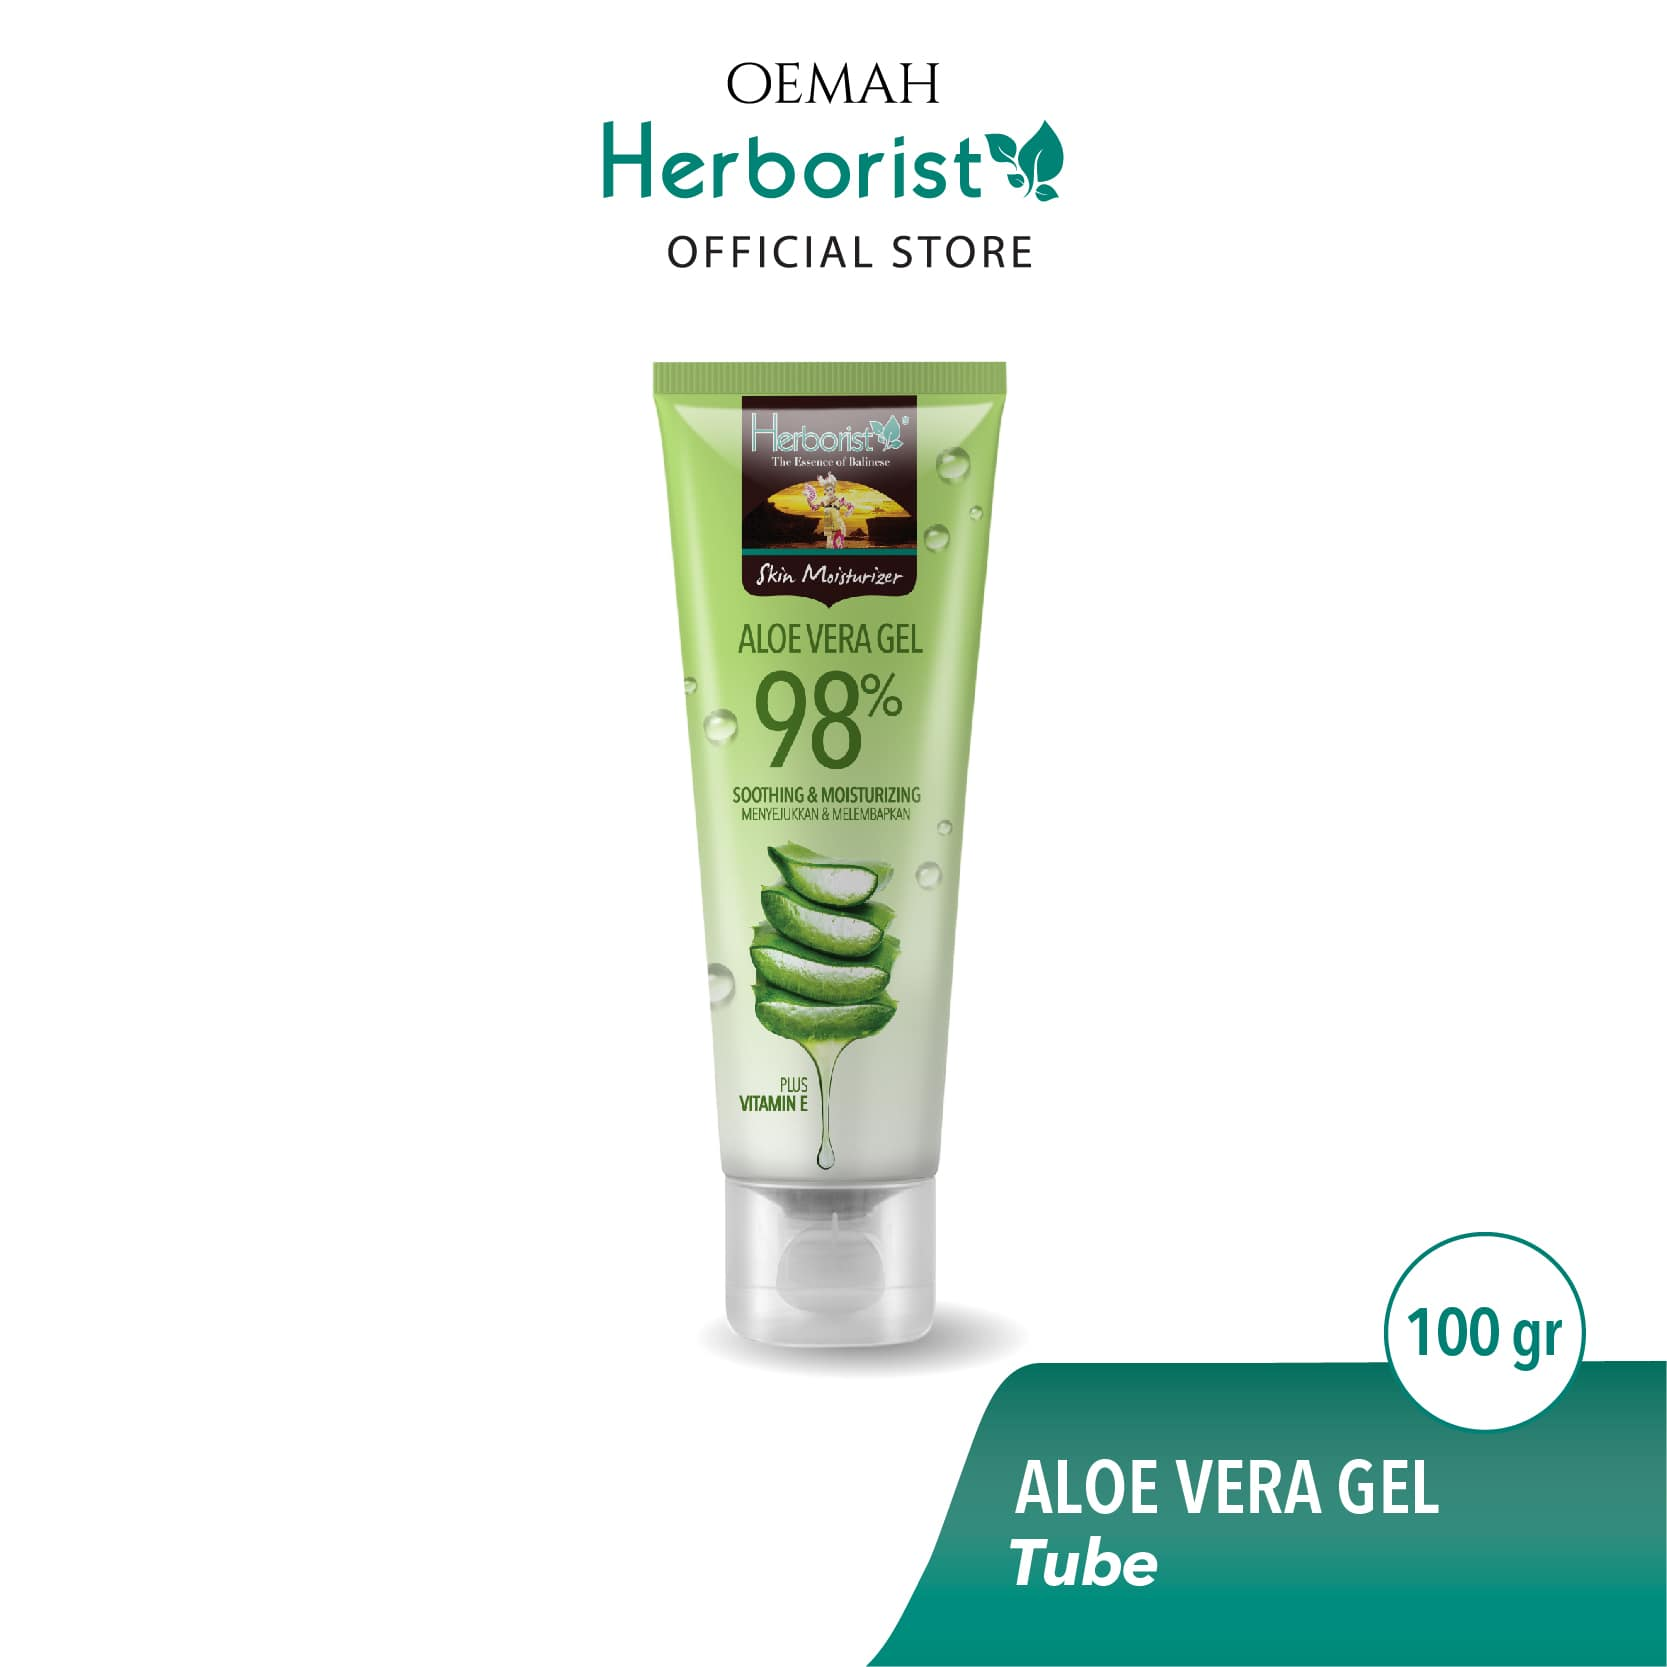 Herborist Aloe Vera Gel Tube 100gr